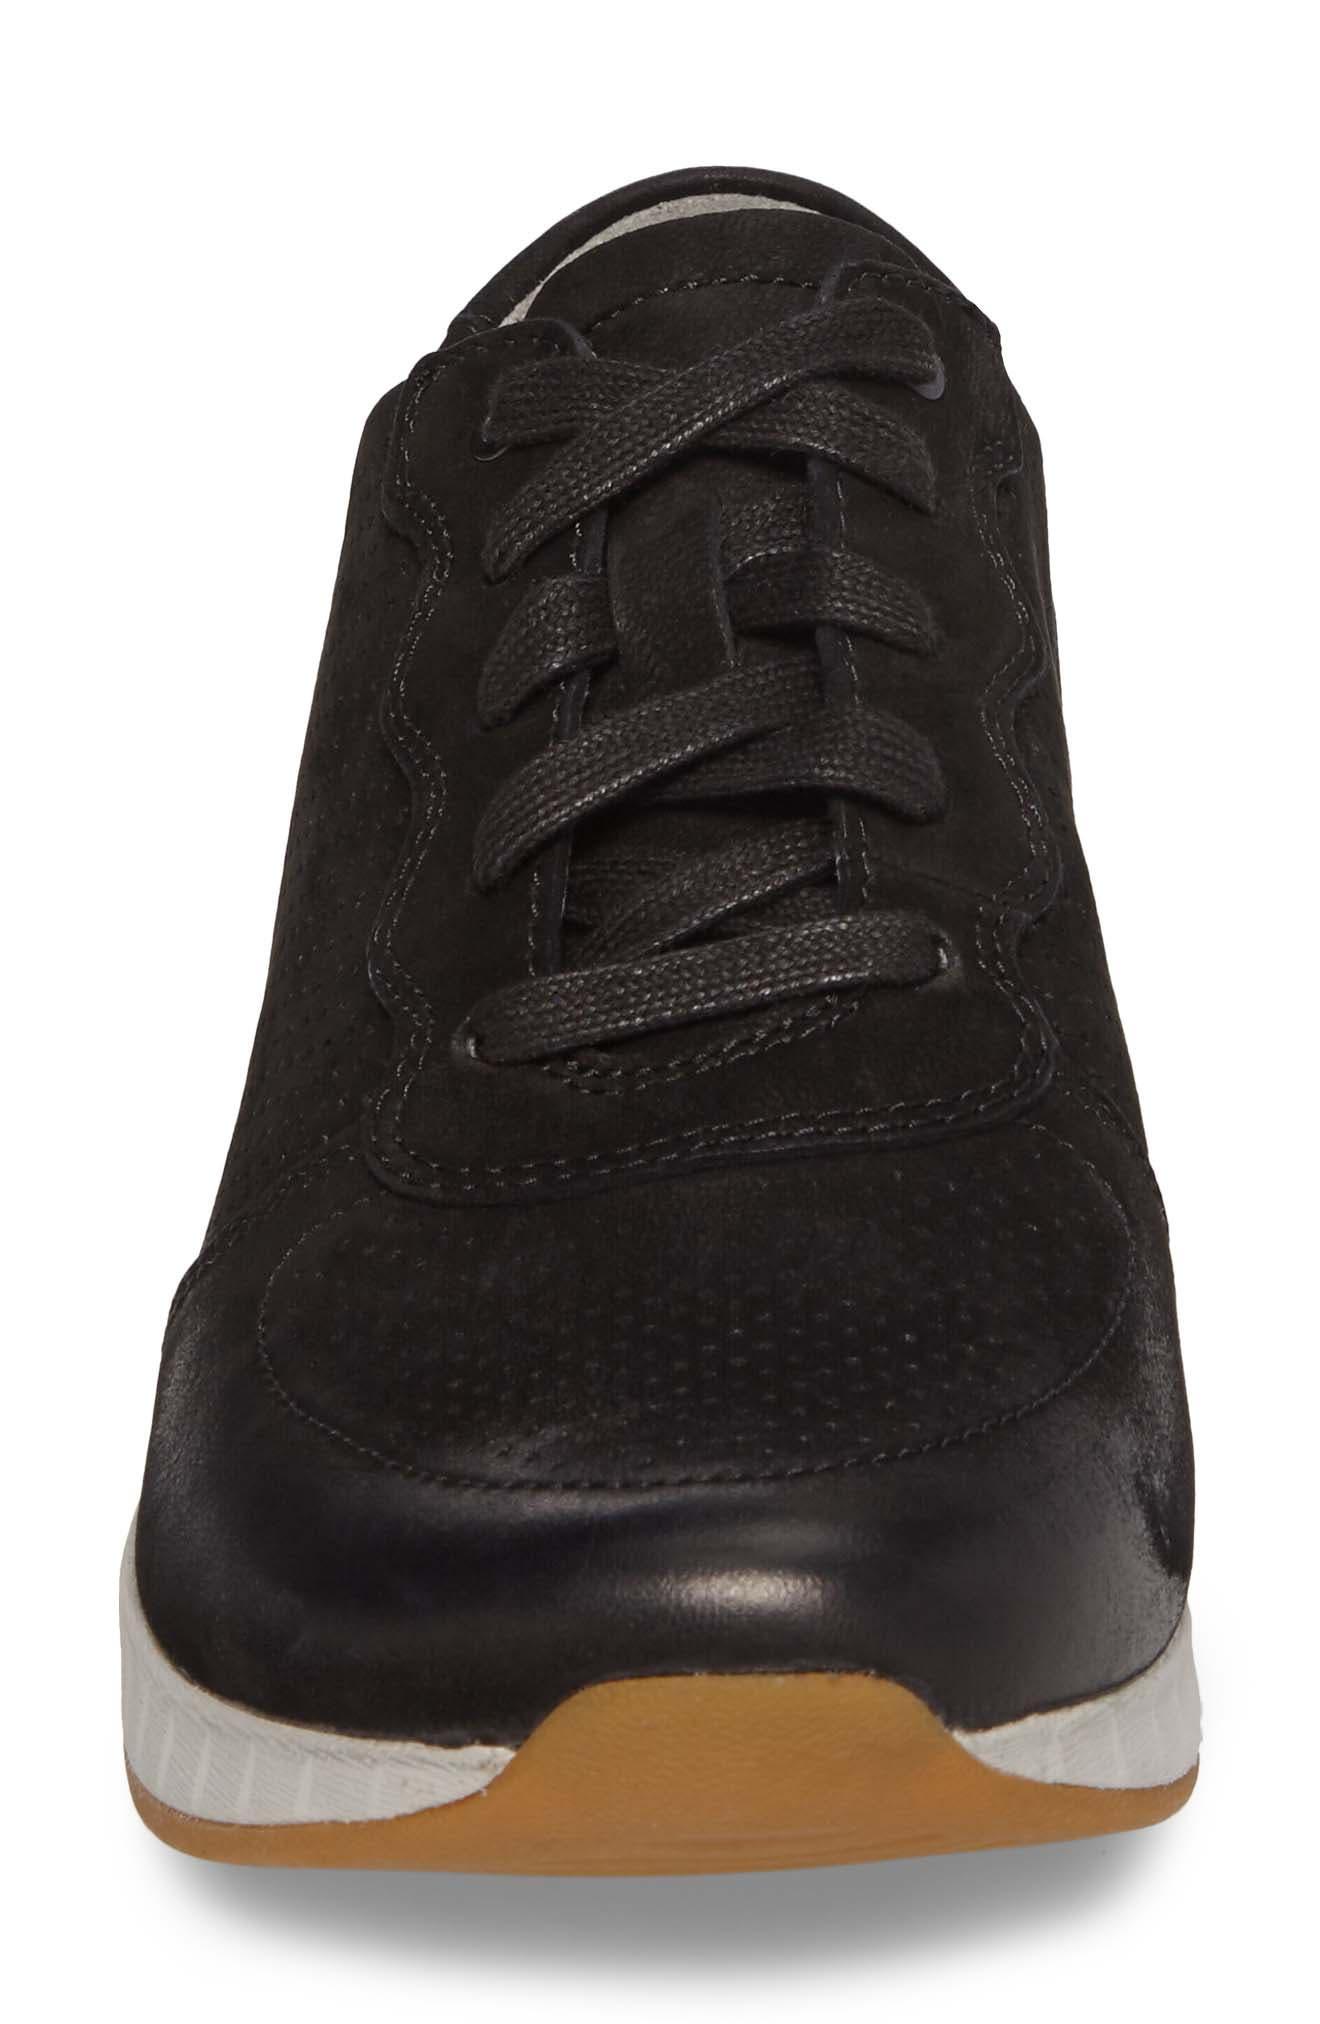 Christina Sneaker,                             Alternate thumbnail 4, color,                             Black Nubuck Leather